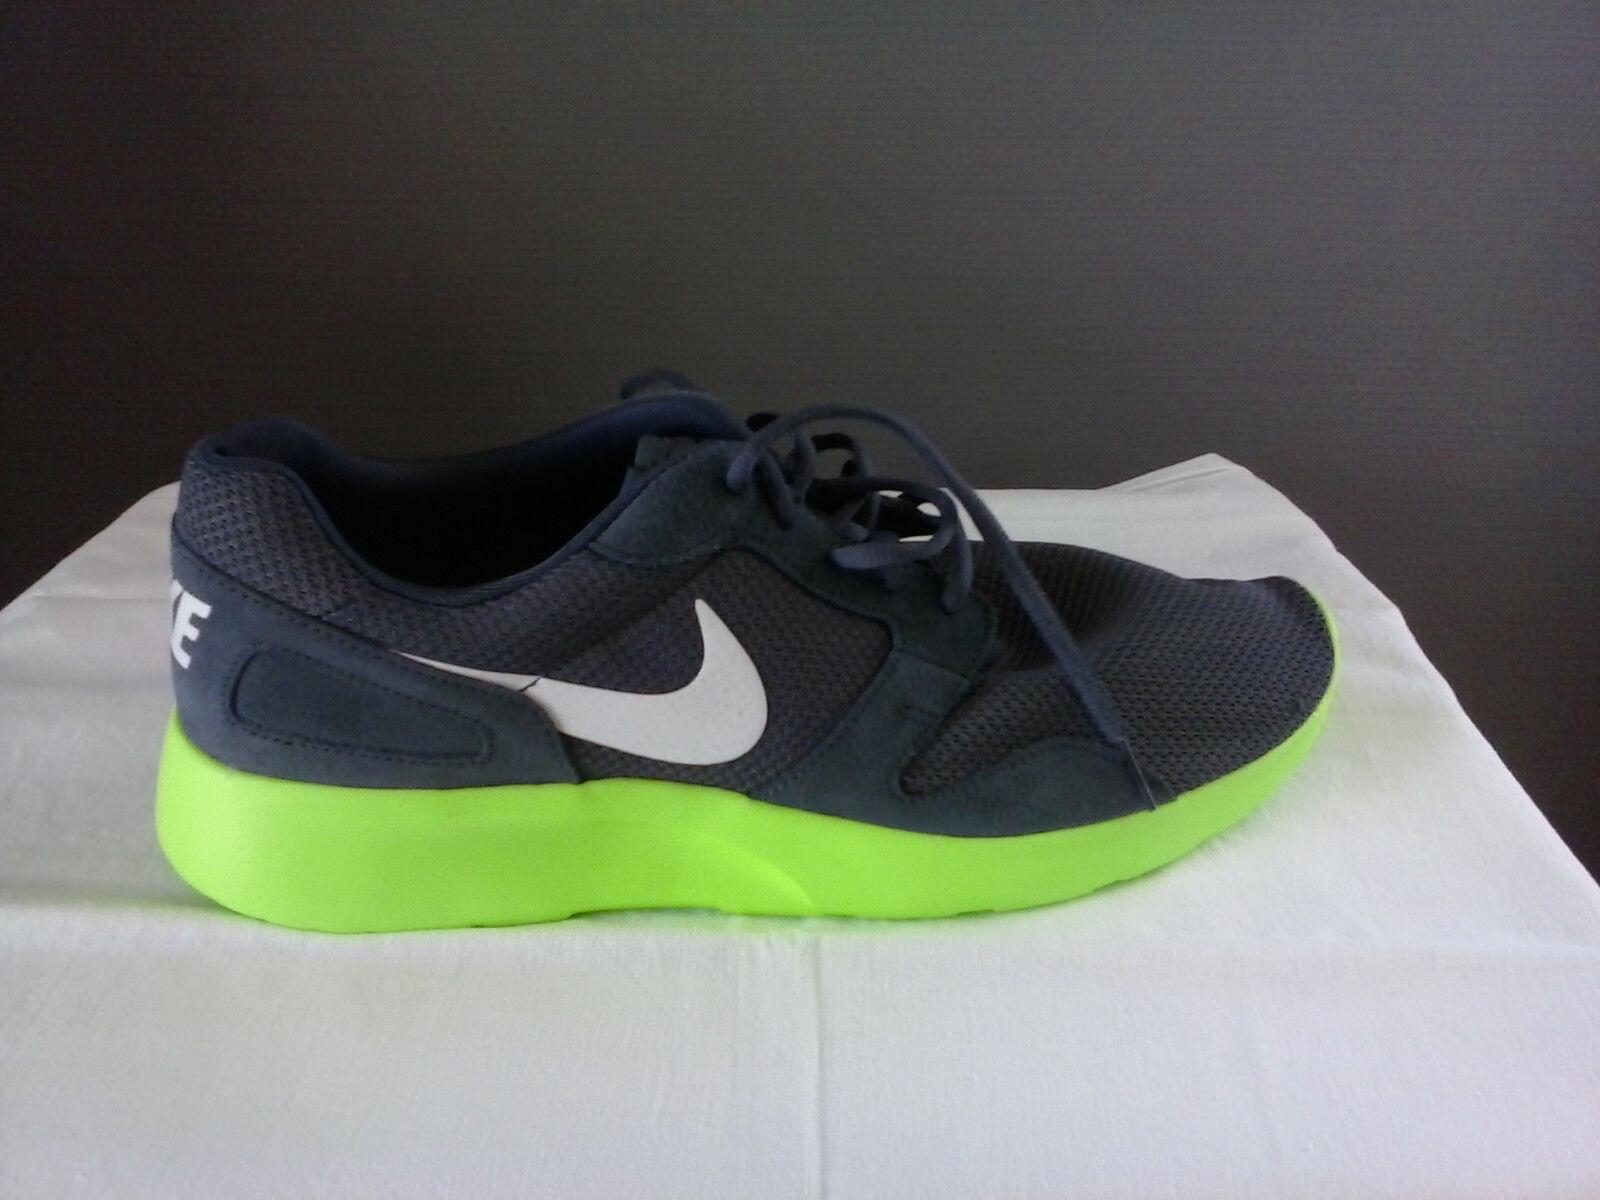 Nike Kaishi dunkelgrau Gr. 48,5 48,5 Gr. (14) 94d884